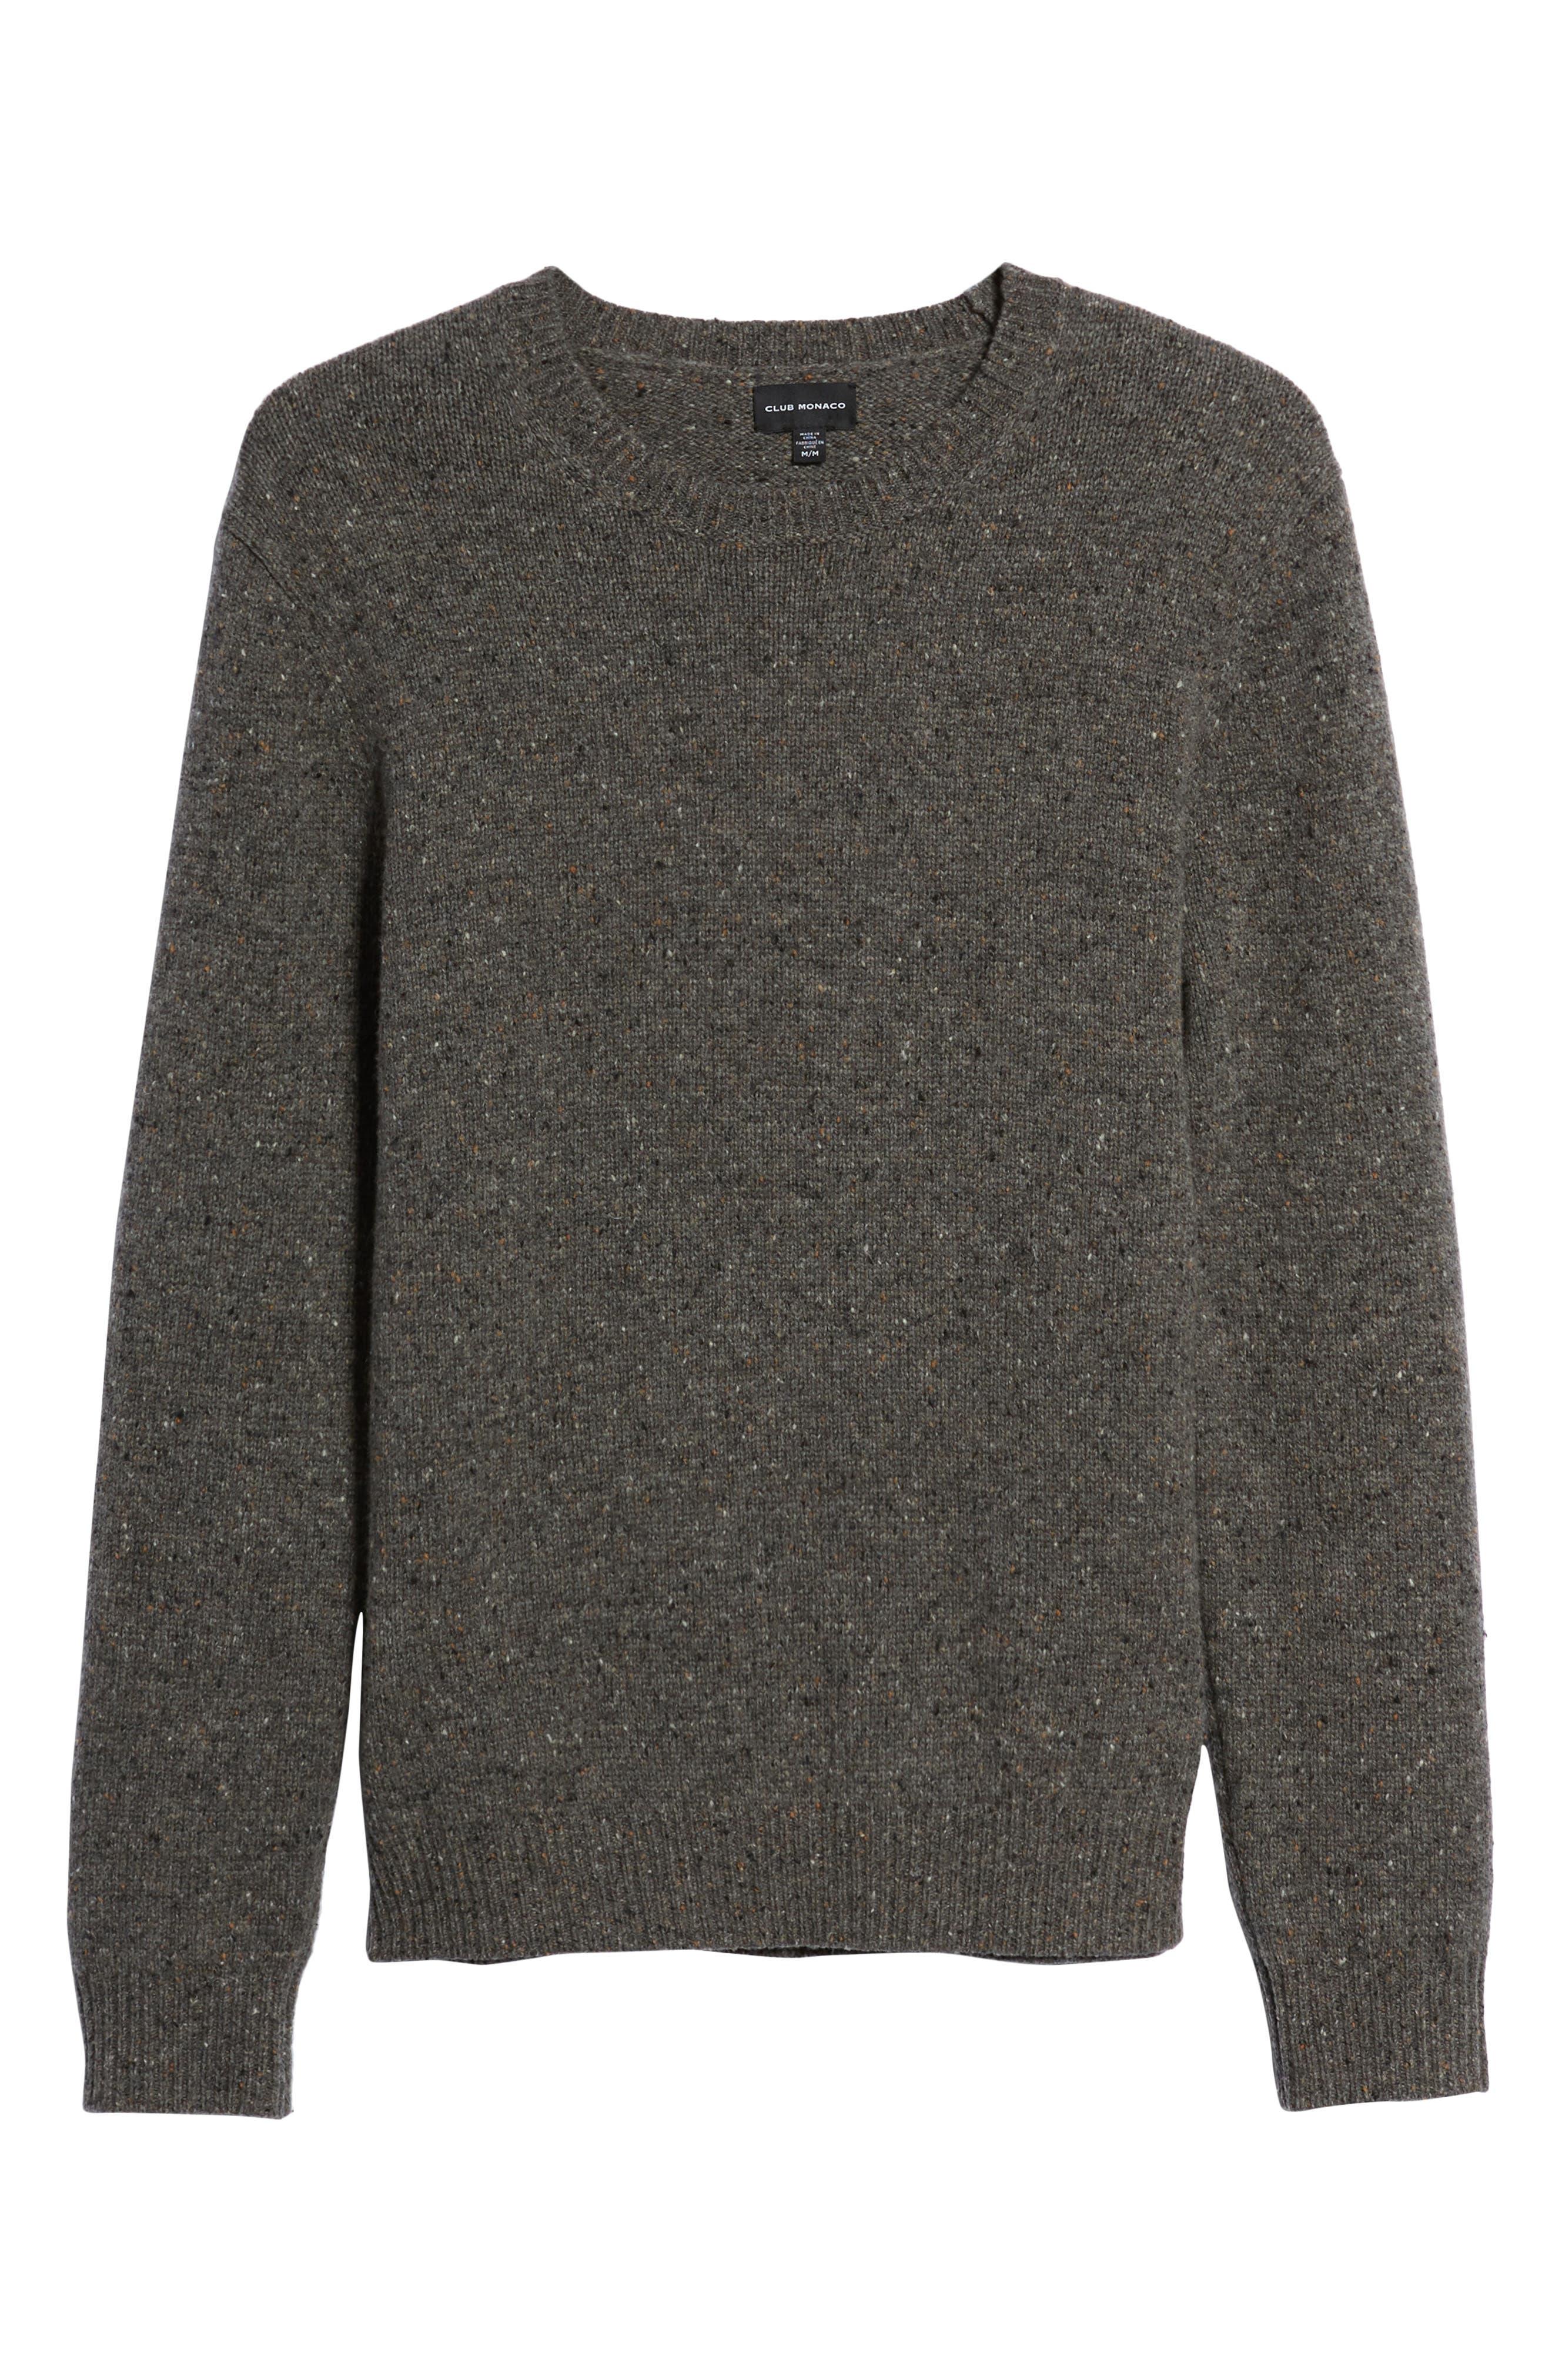 Jaxon Trim Fit Wool Sweater,                             Alternate thumbnail 6, color,                             GREY MULTI